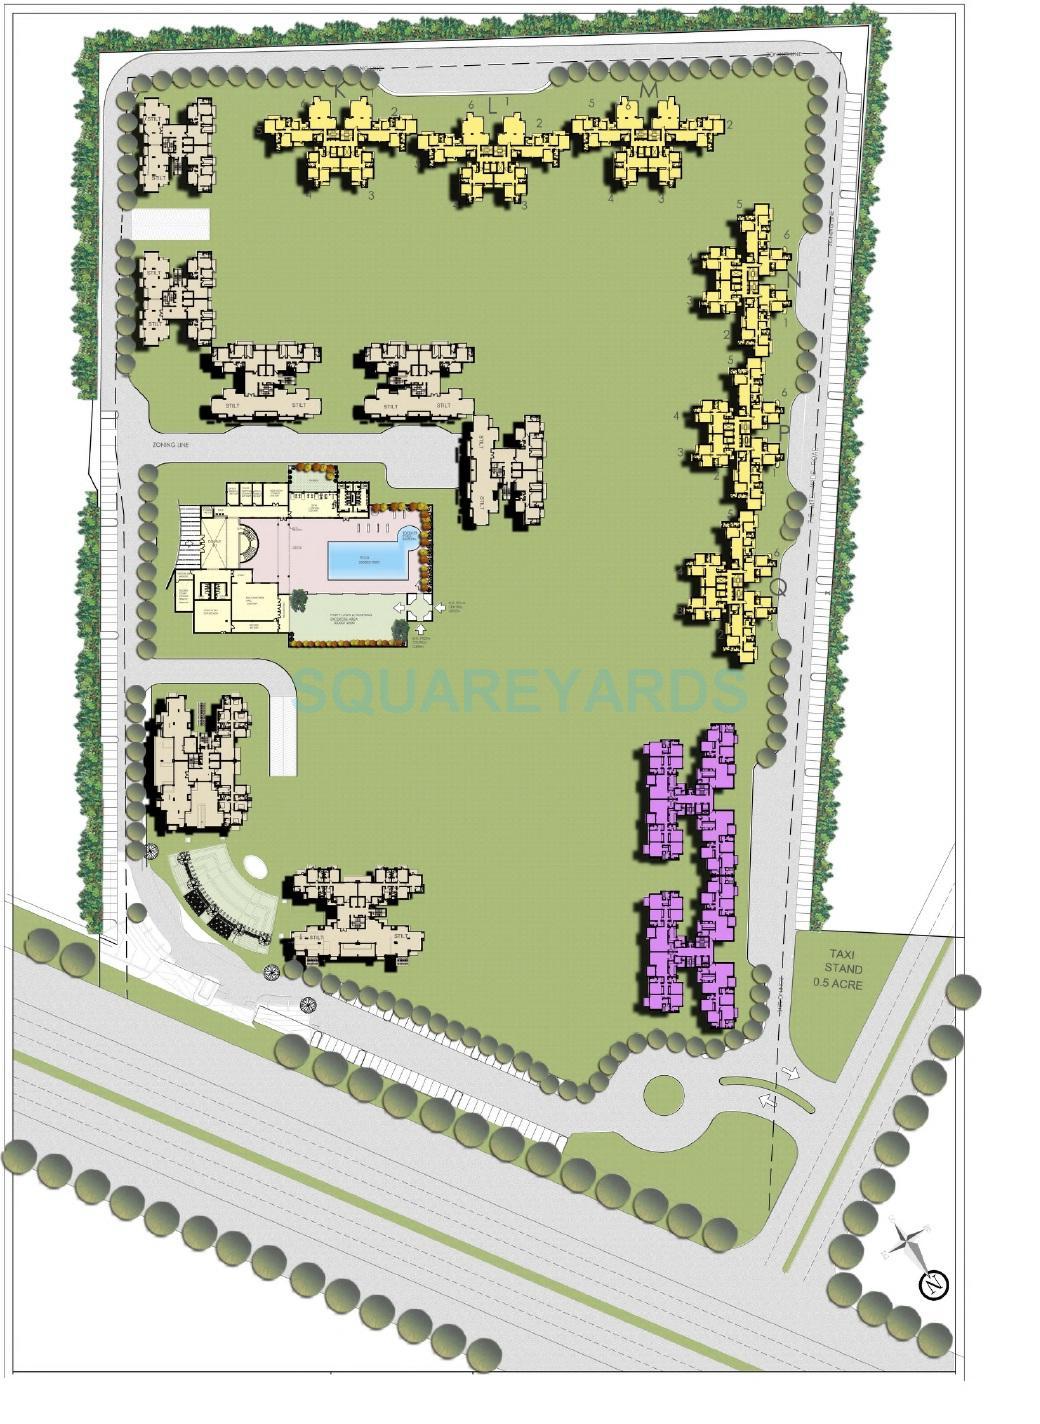 bptp spacio park serene master plan image1